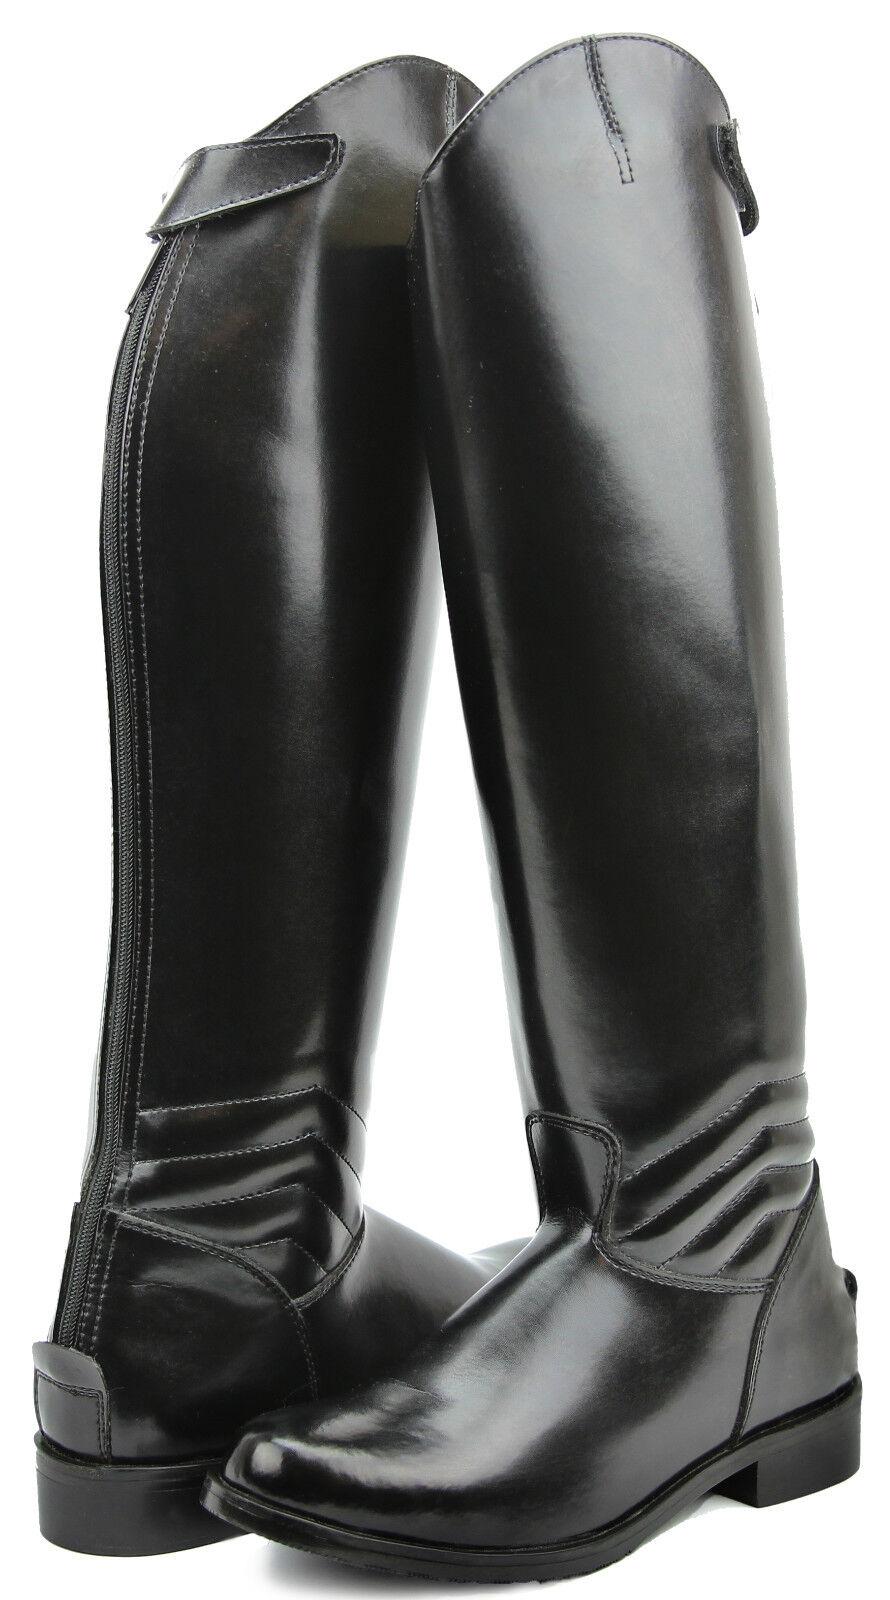 Hispar Ladies Elegant Dress Dressage Boots With Zipper  Riding English Equestrian  save up to 80%